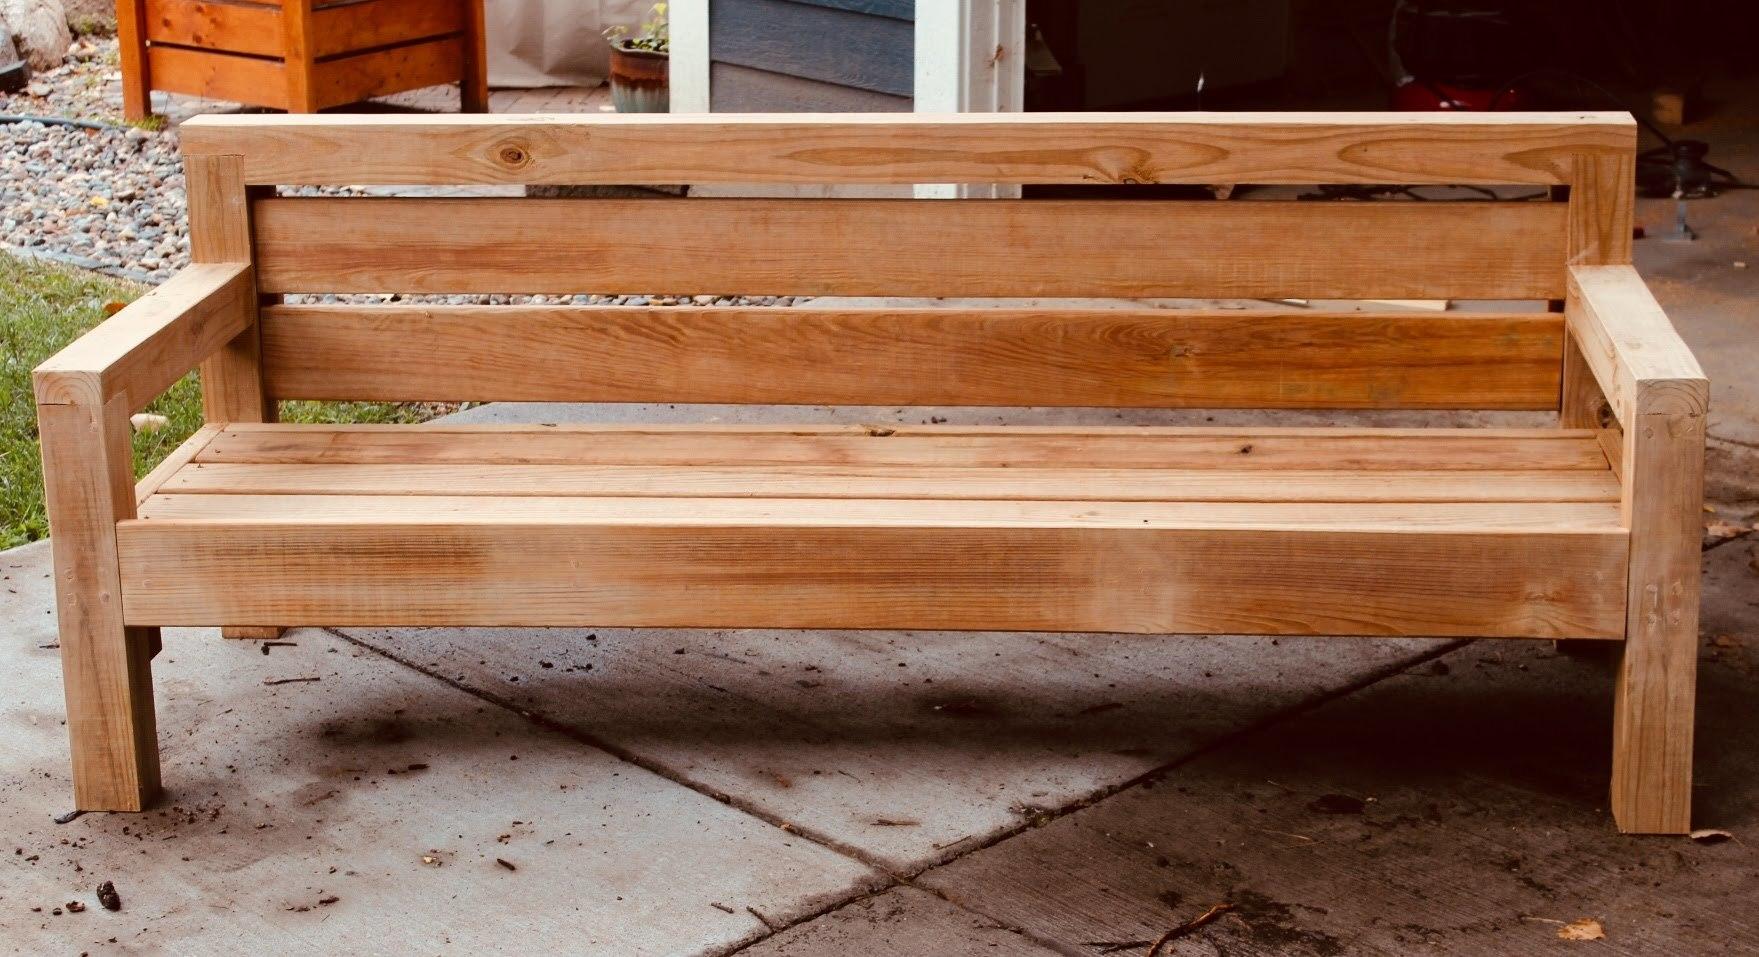 How to: Build an Outdoor Sofa | Man Made DIY | Crafts for Men